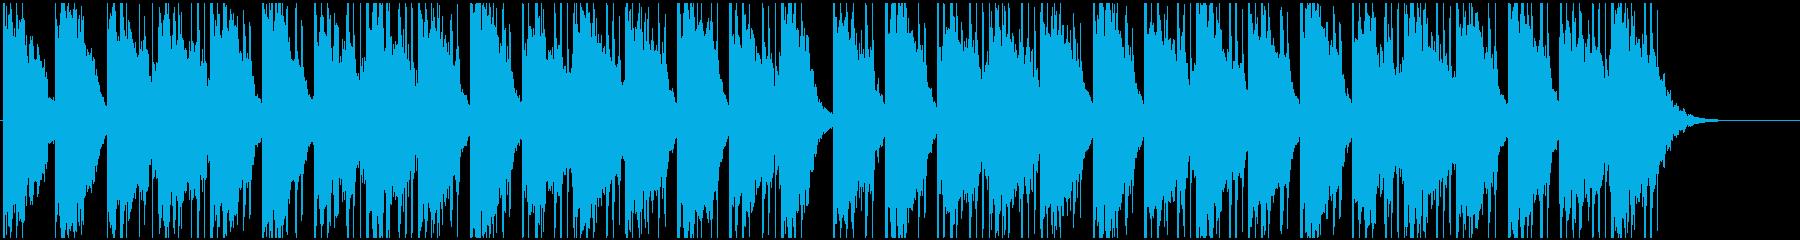 【LOFI HIPHOP】深夜集中Cの再生済みの波形